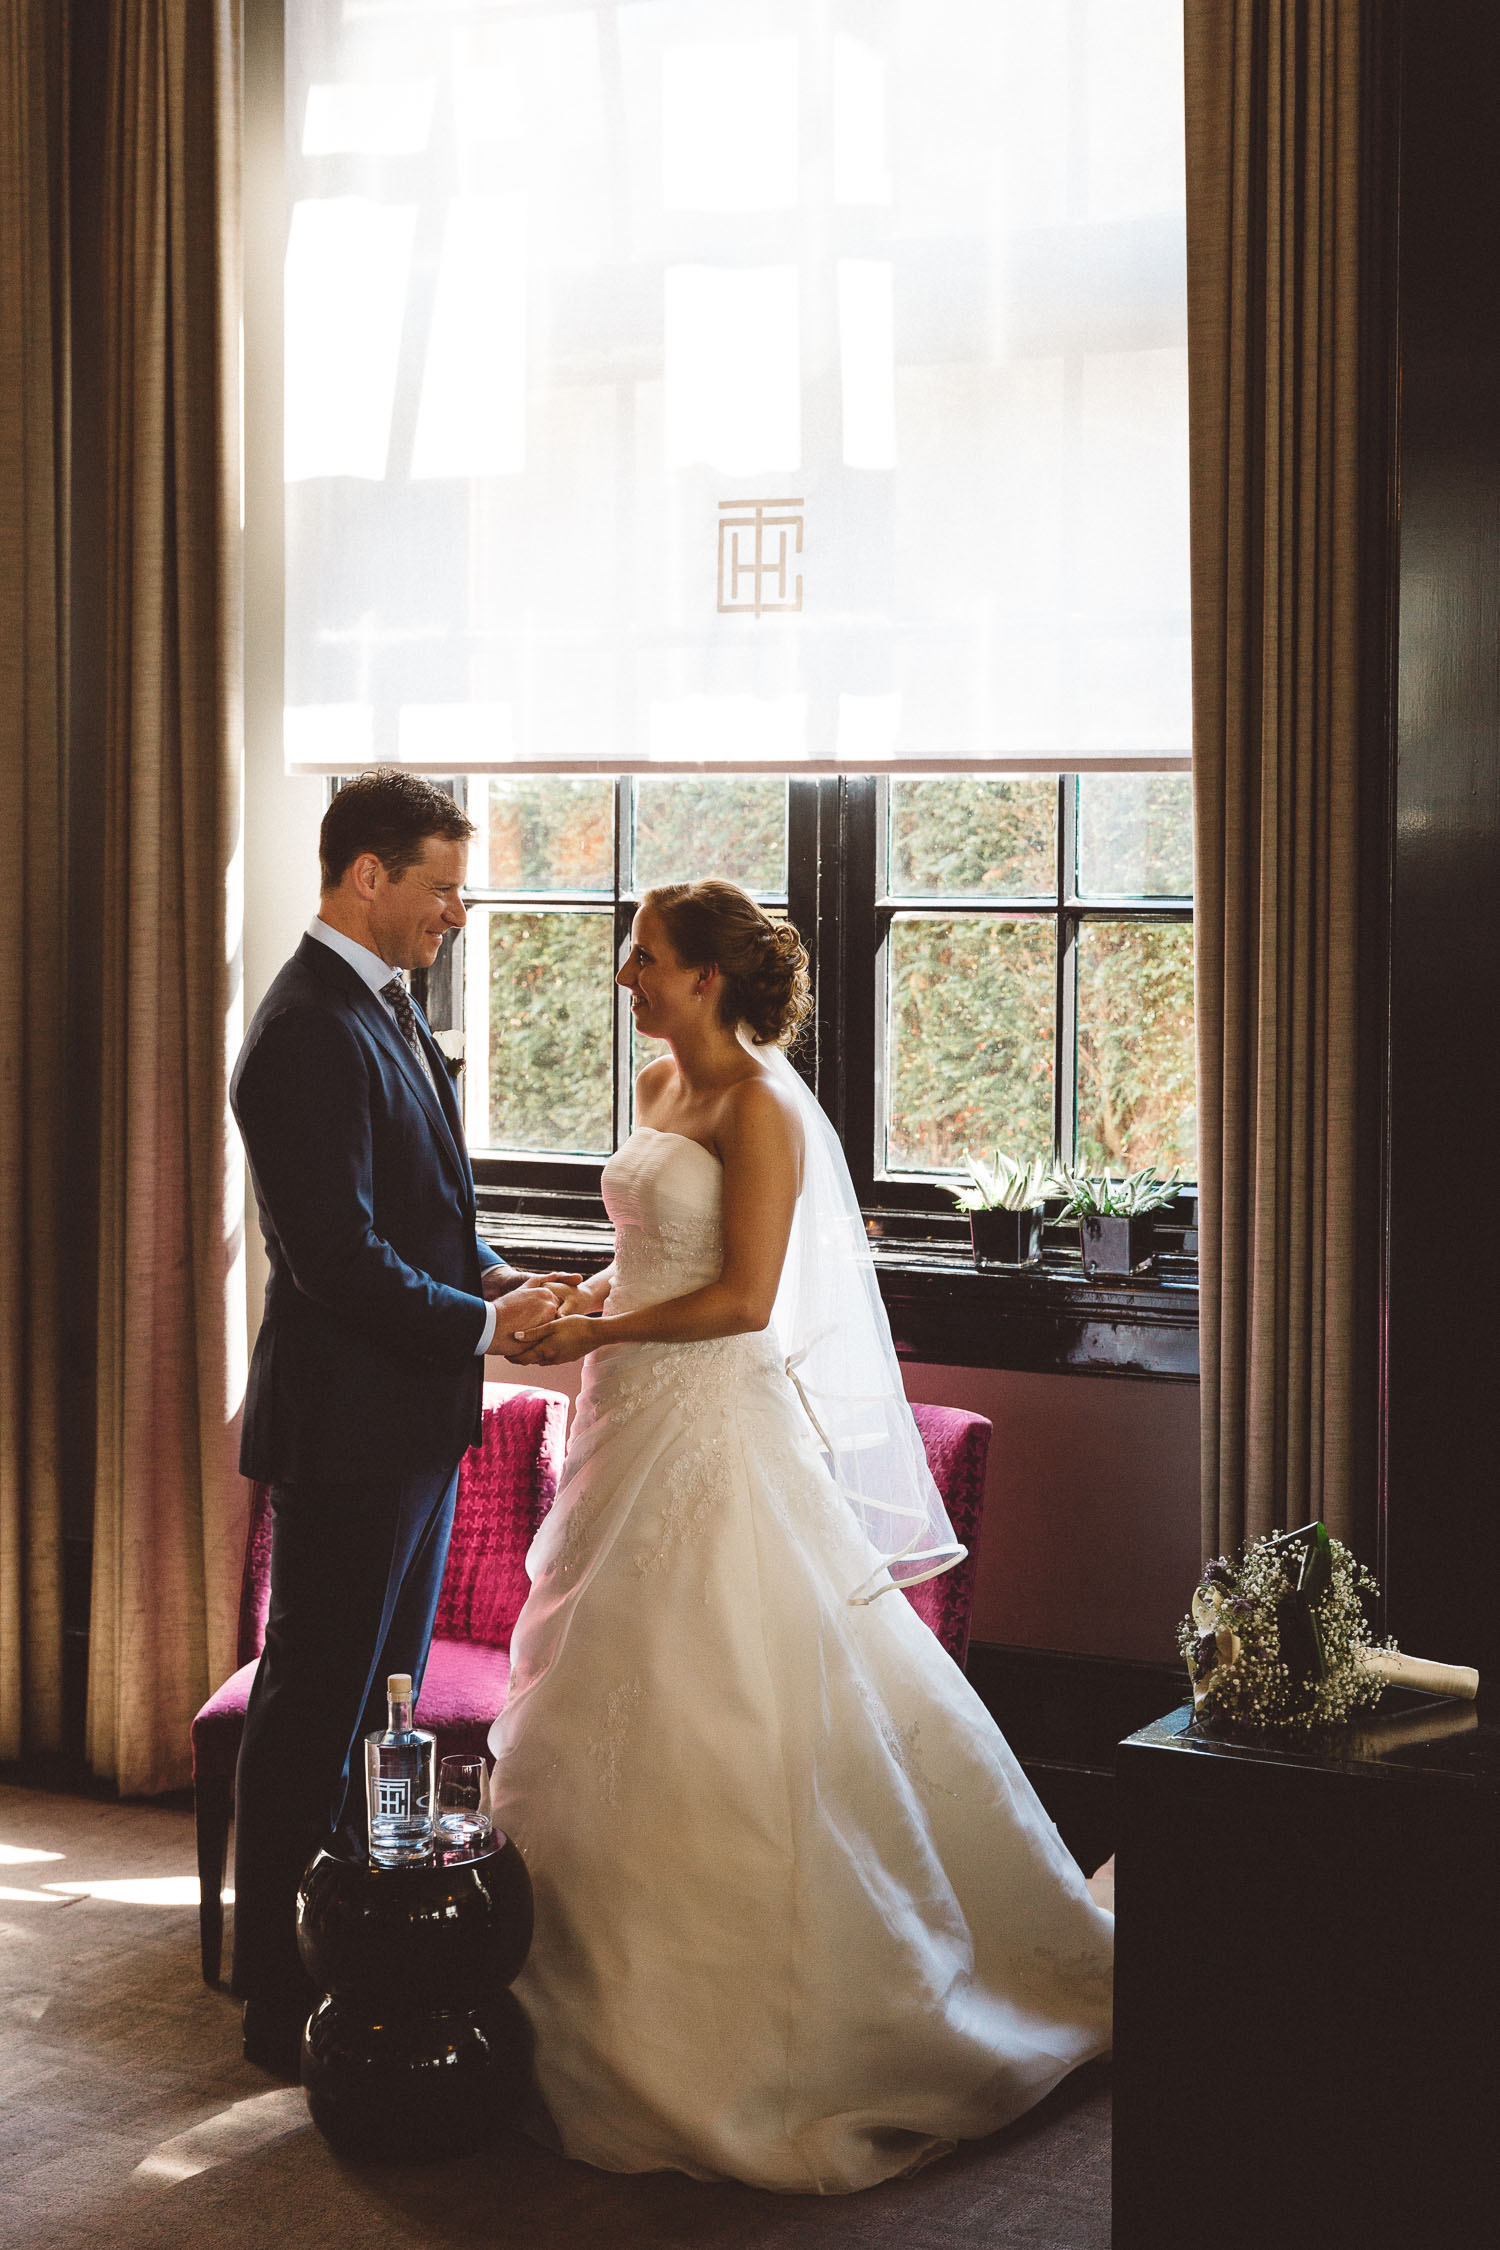 Wedding-huwelijk-trouwen-bruiloft-photography-fotografie-fotograaf-photographer-Rijksmuseum-College-Hotel-On-a-hazy-morning-Amsterdam-The-Netherlands-204.jpg